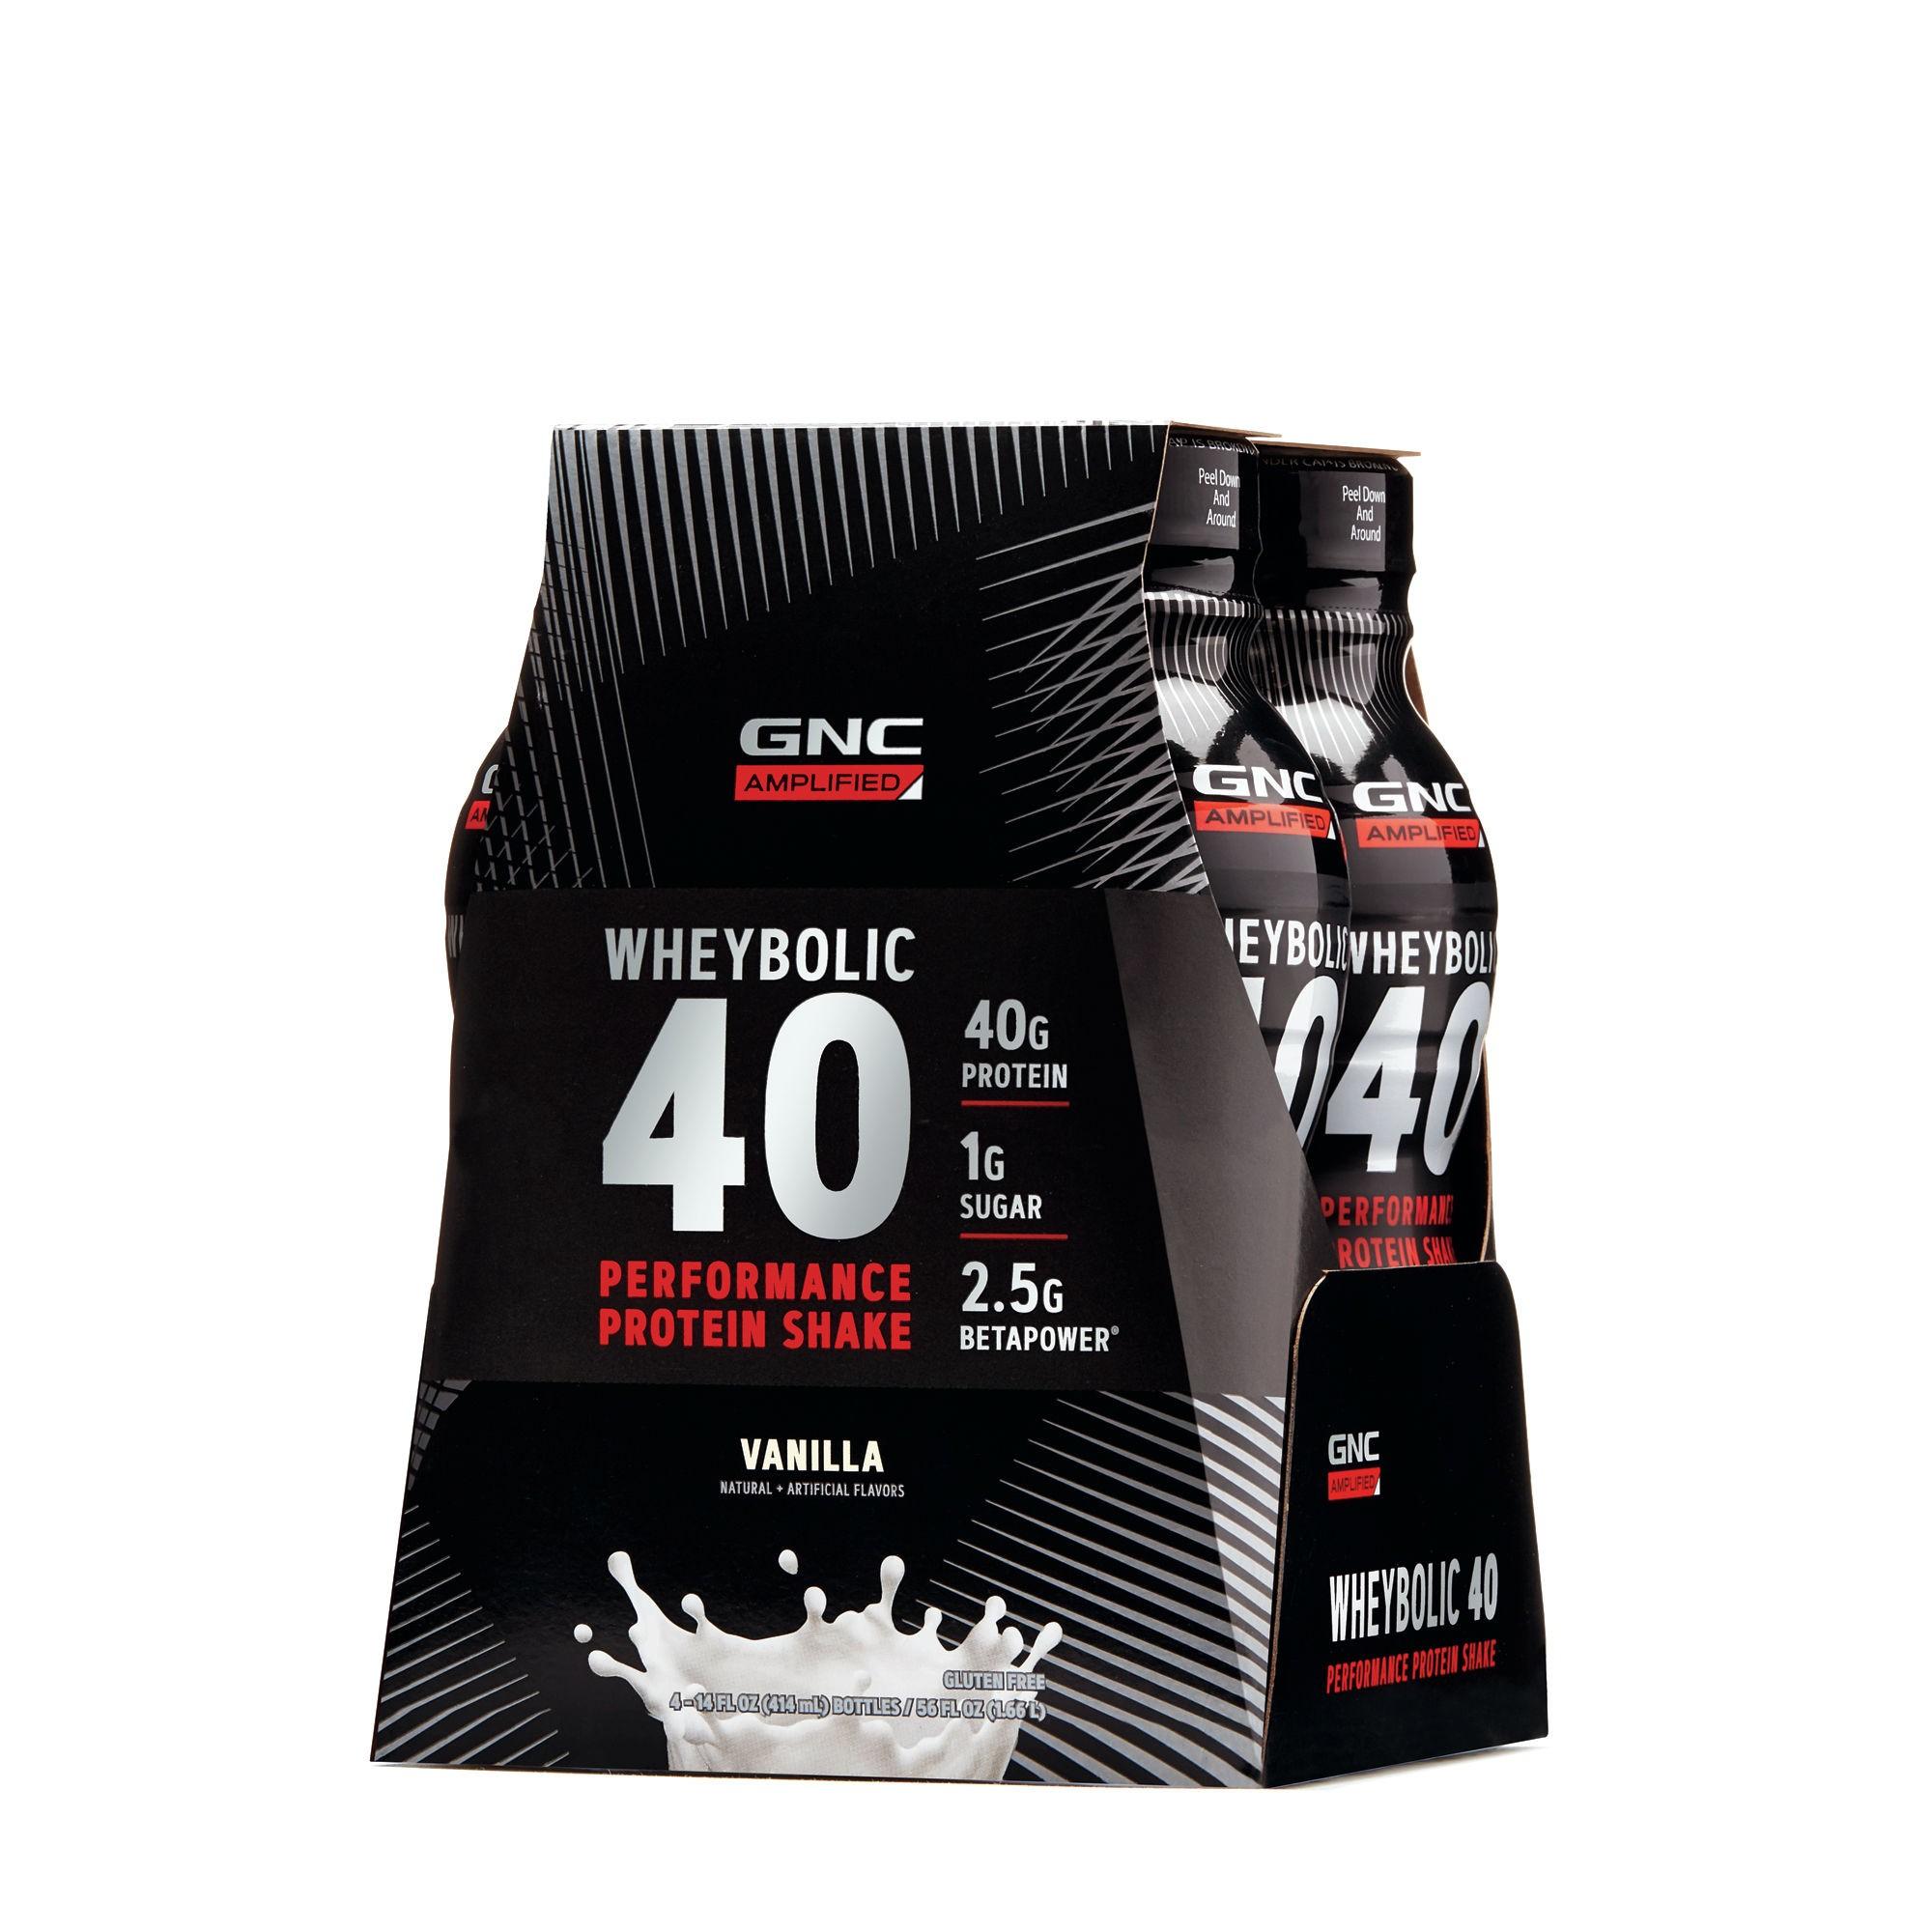 GNC AMP Wheybolic 40, Shake Proteic, cu Aroma de Vanilie, 414 ml